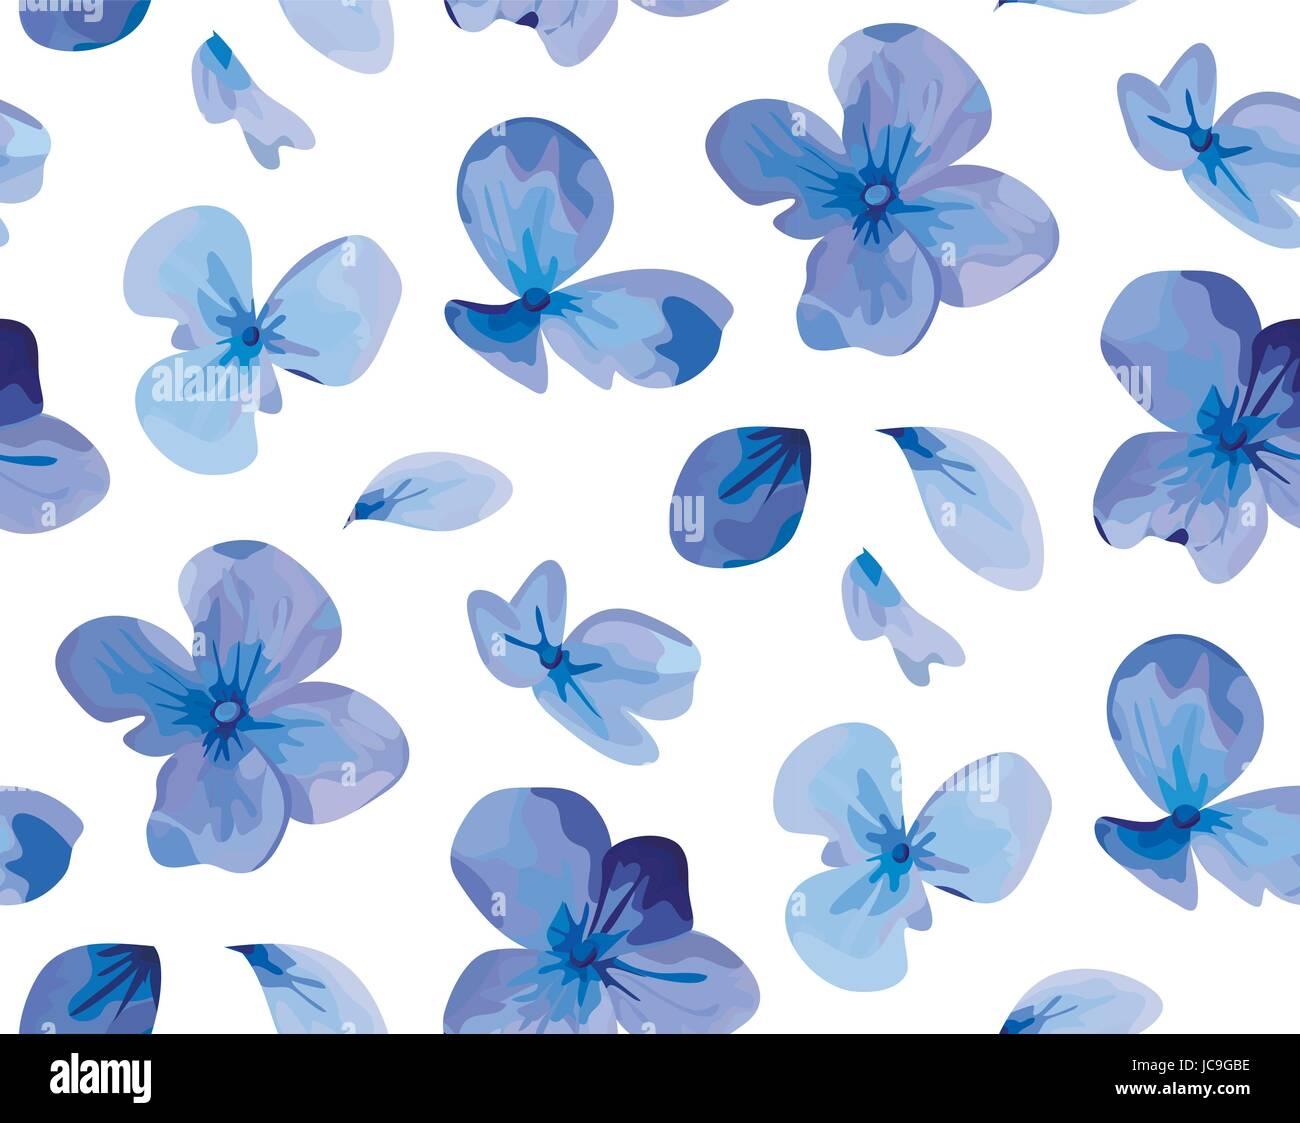 Hortensia Flower Floral Vintage Hydrangea Purple Blue Garden Flowers